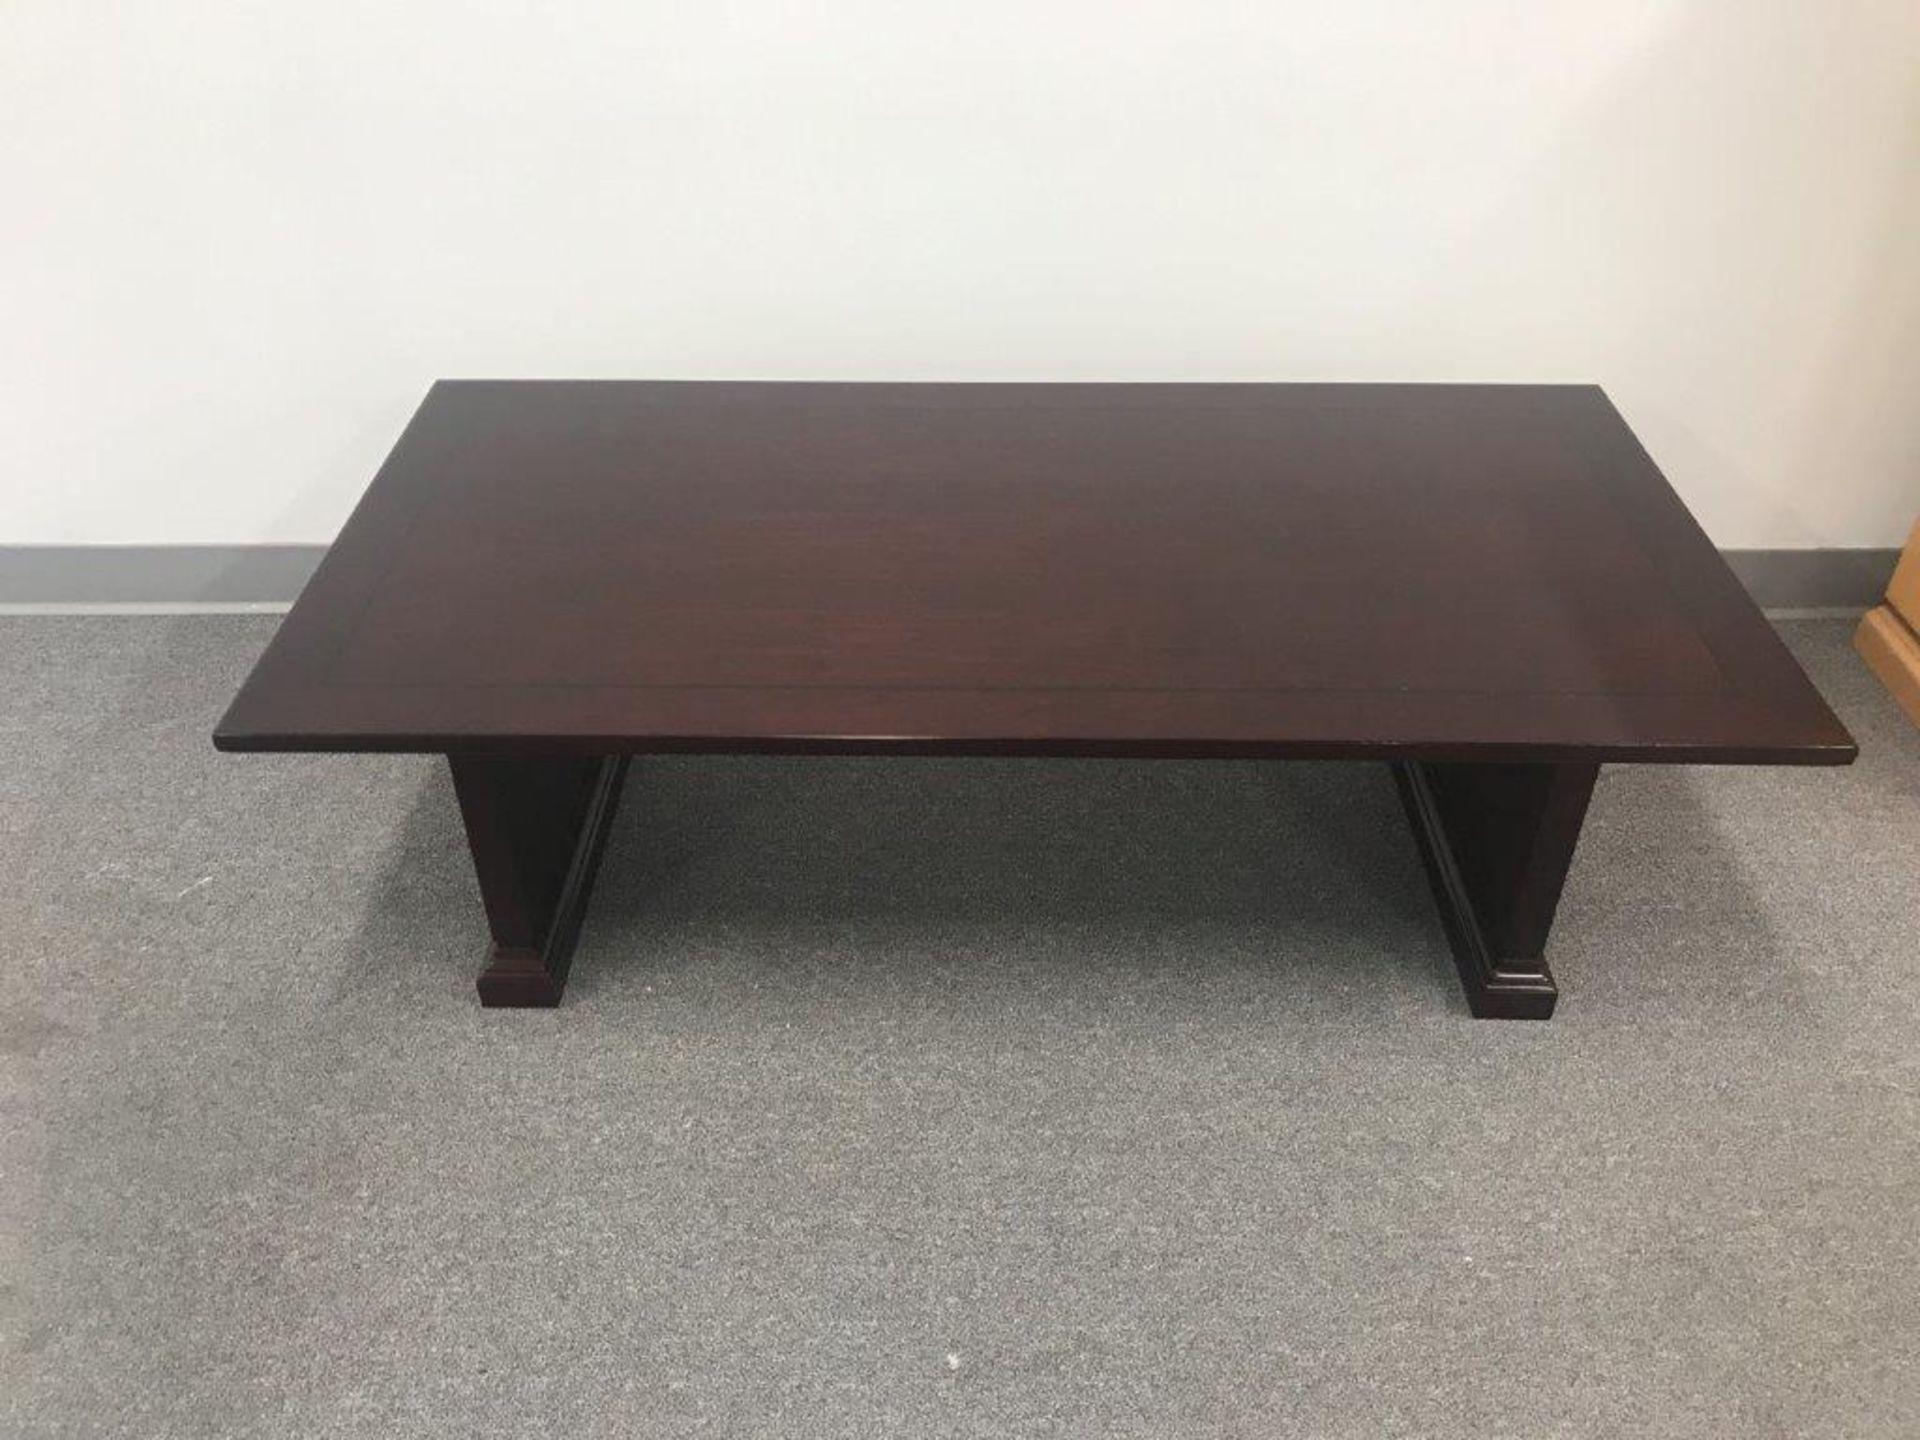 (5) Cherryman Emerald Collection Mahogany Coffee Tables (EM-132) (List price each: $550)